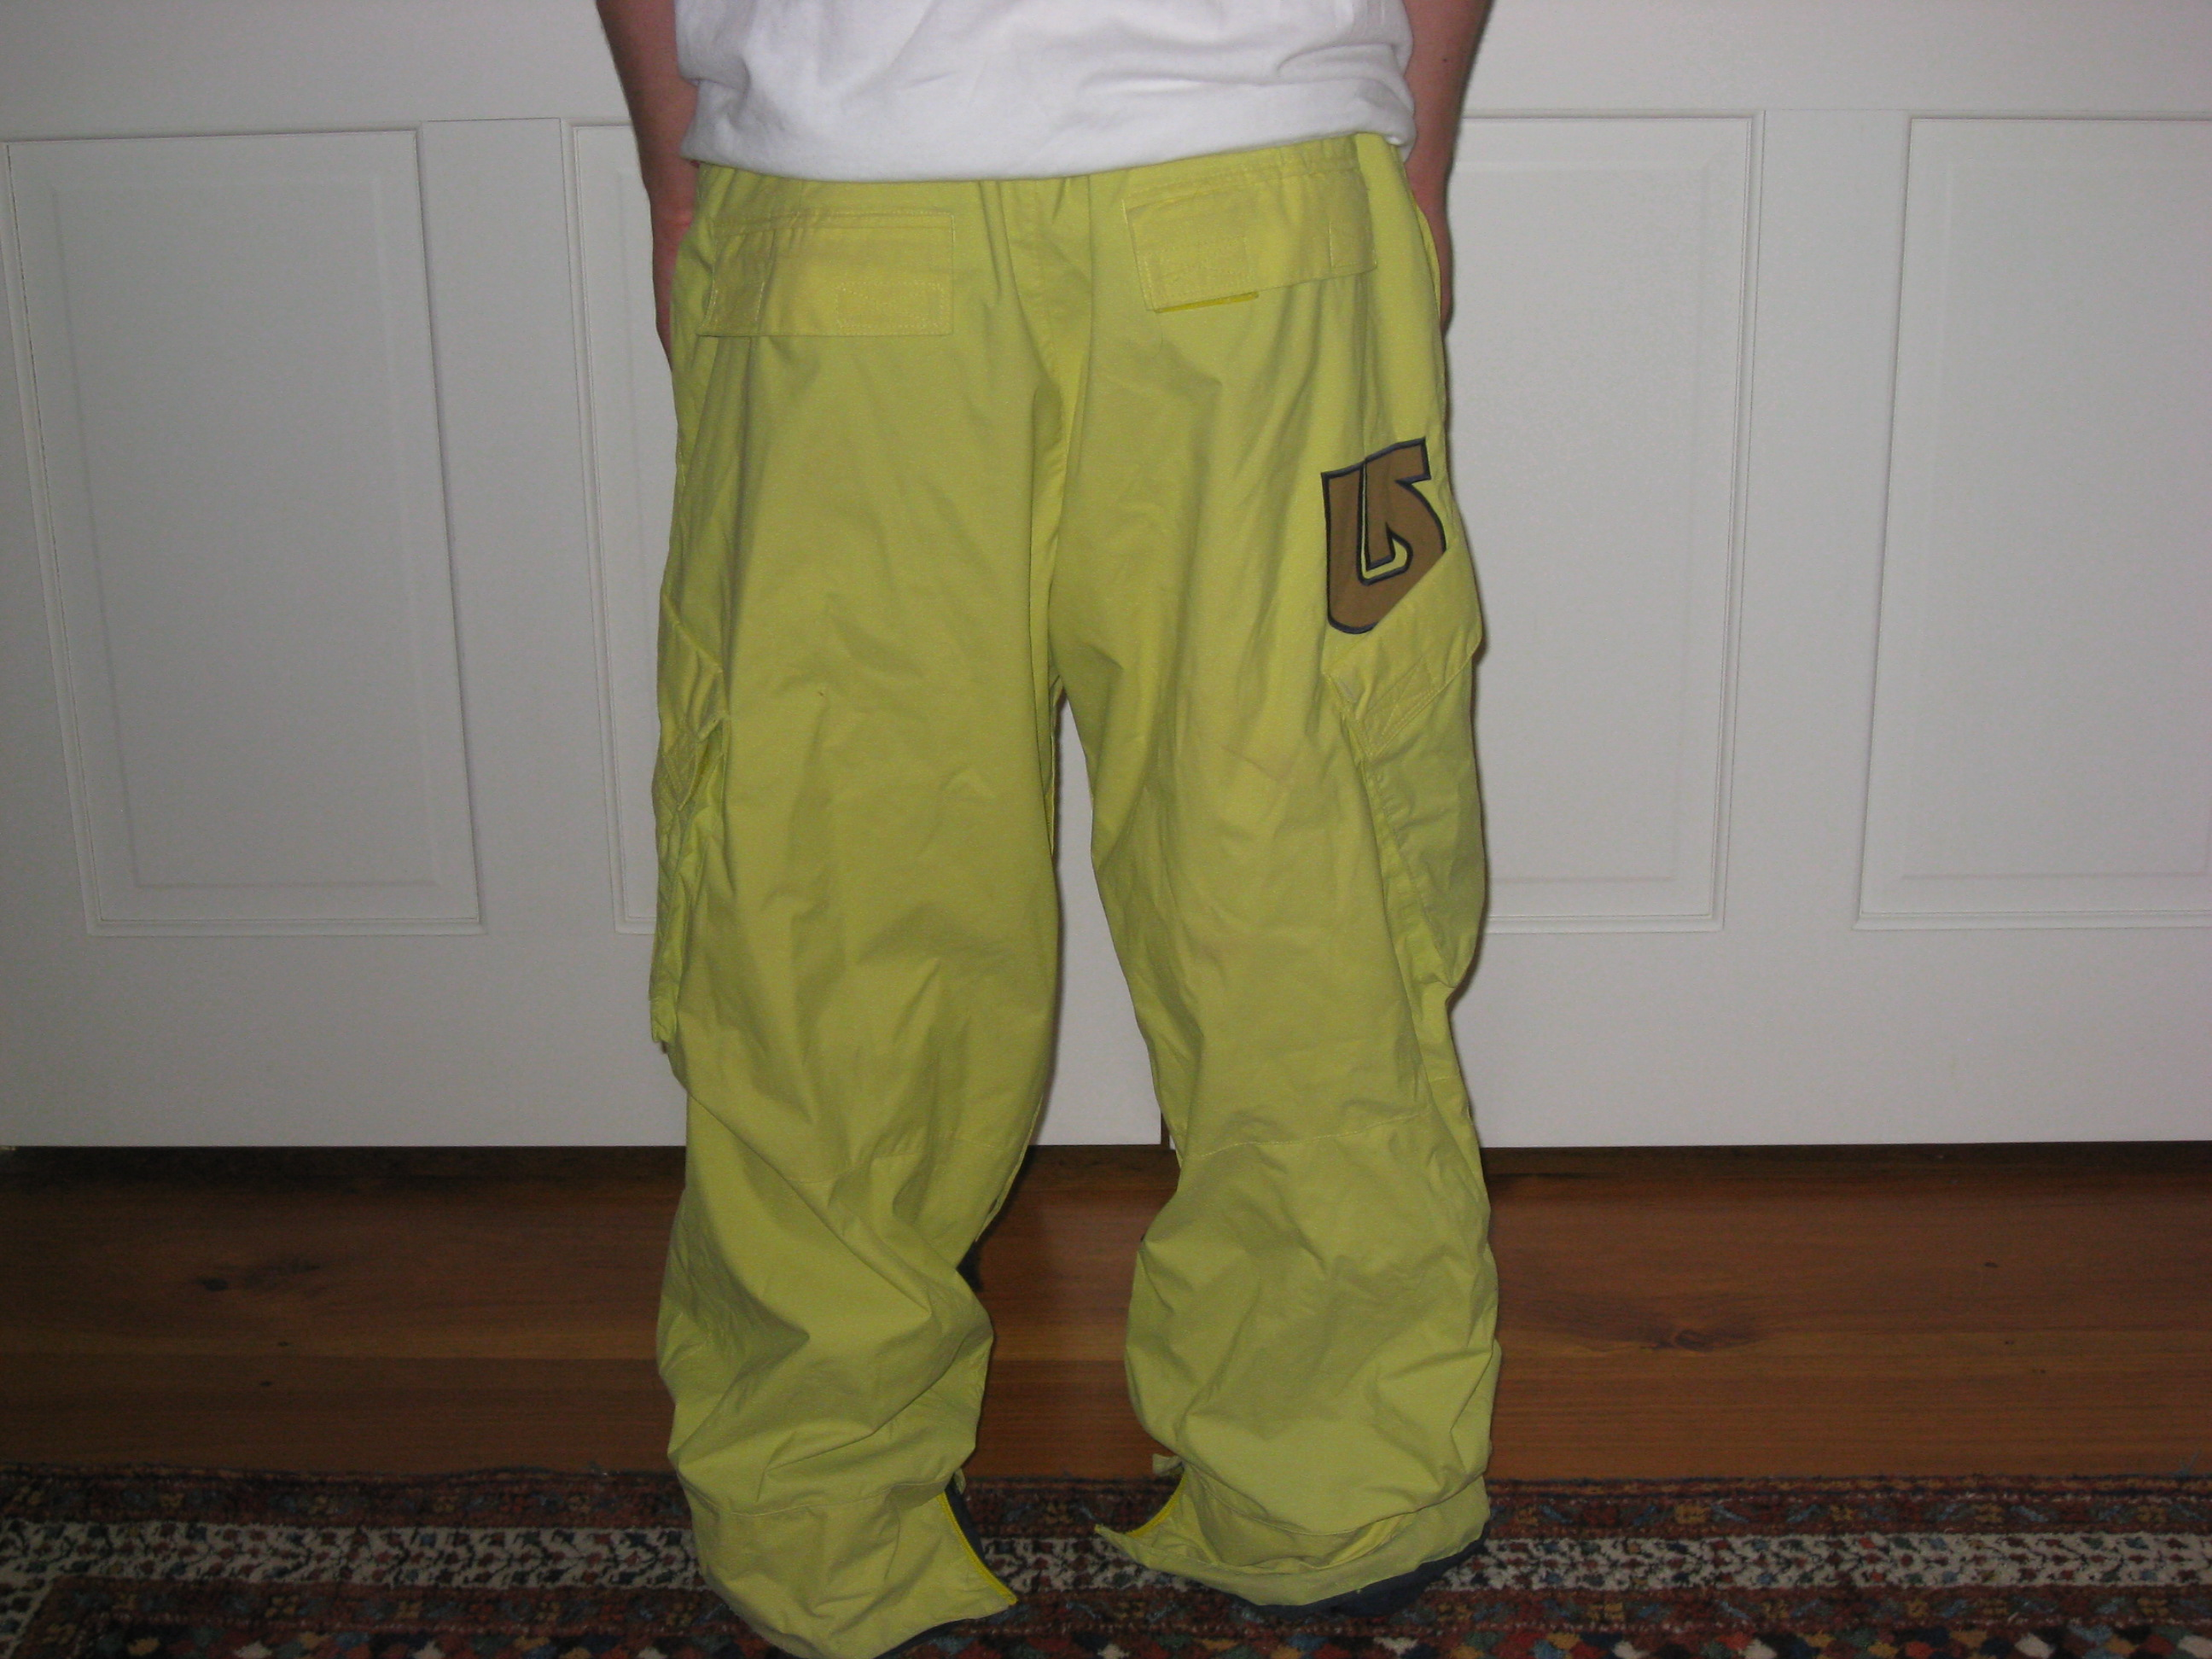 Pants agin